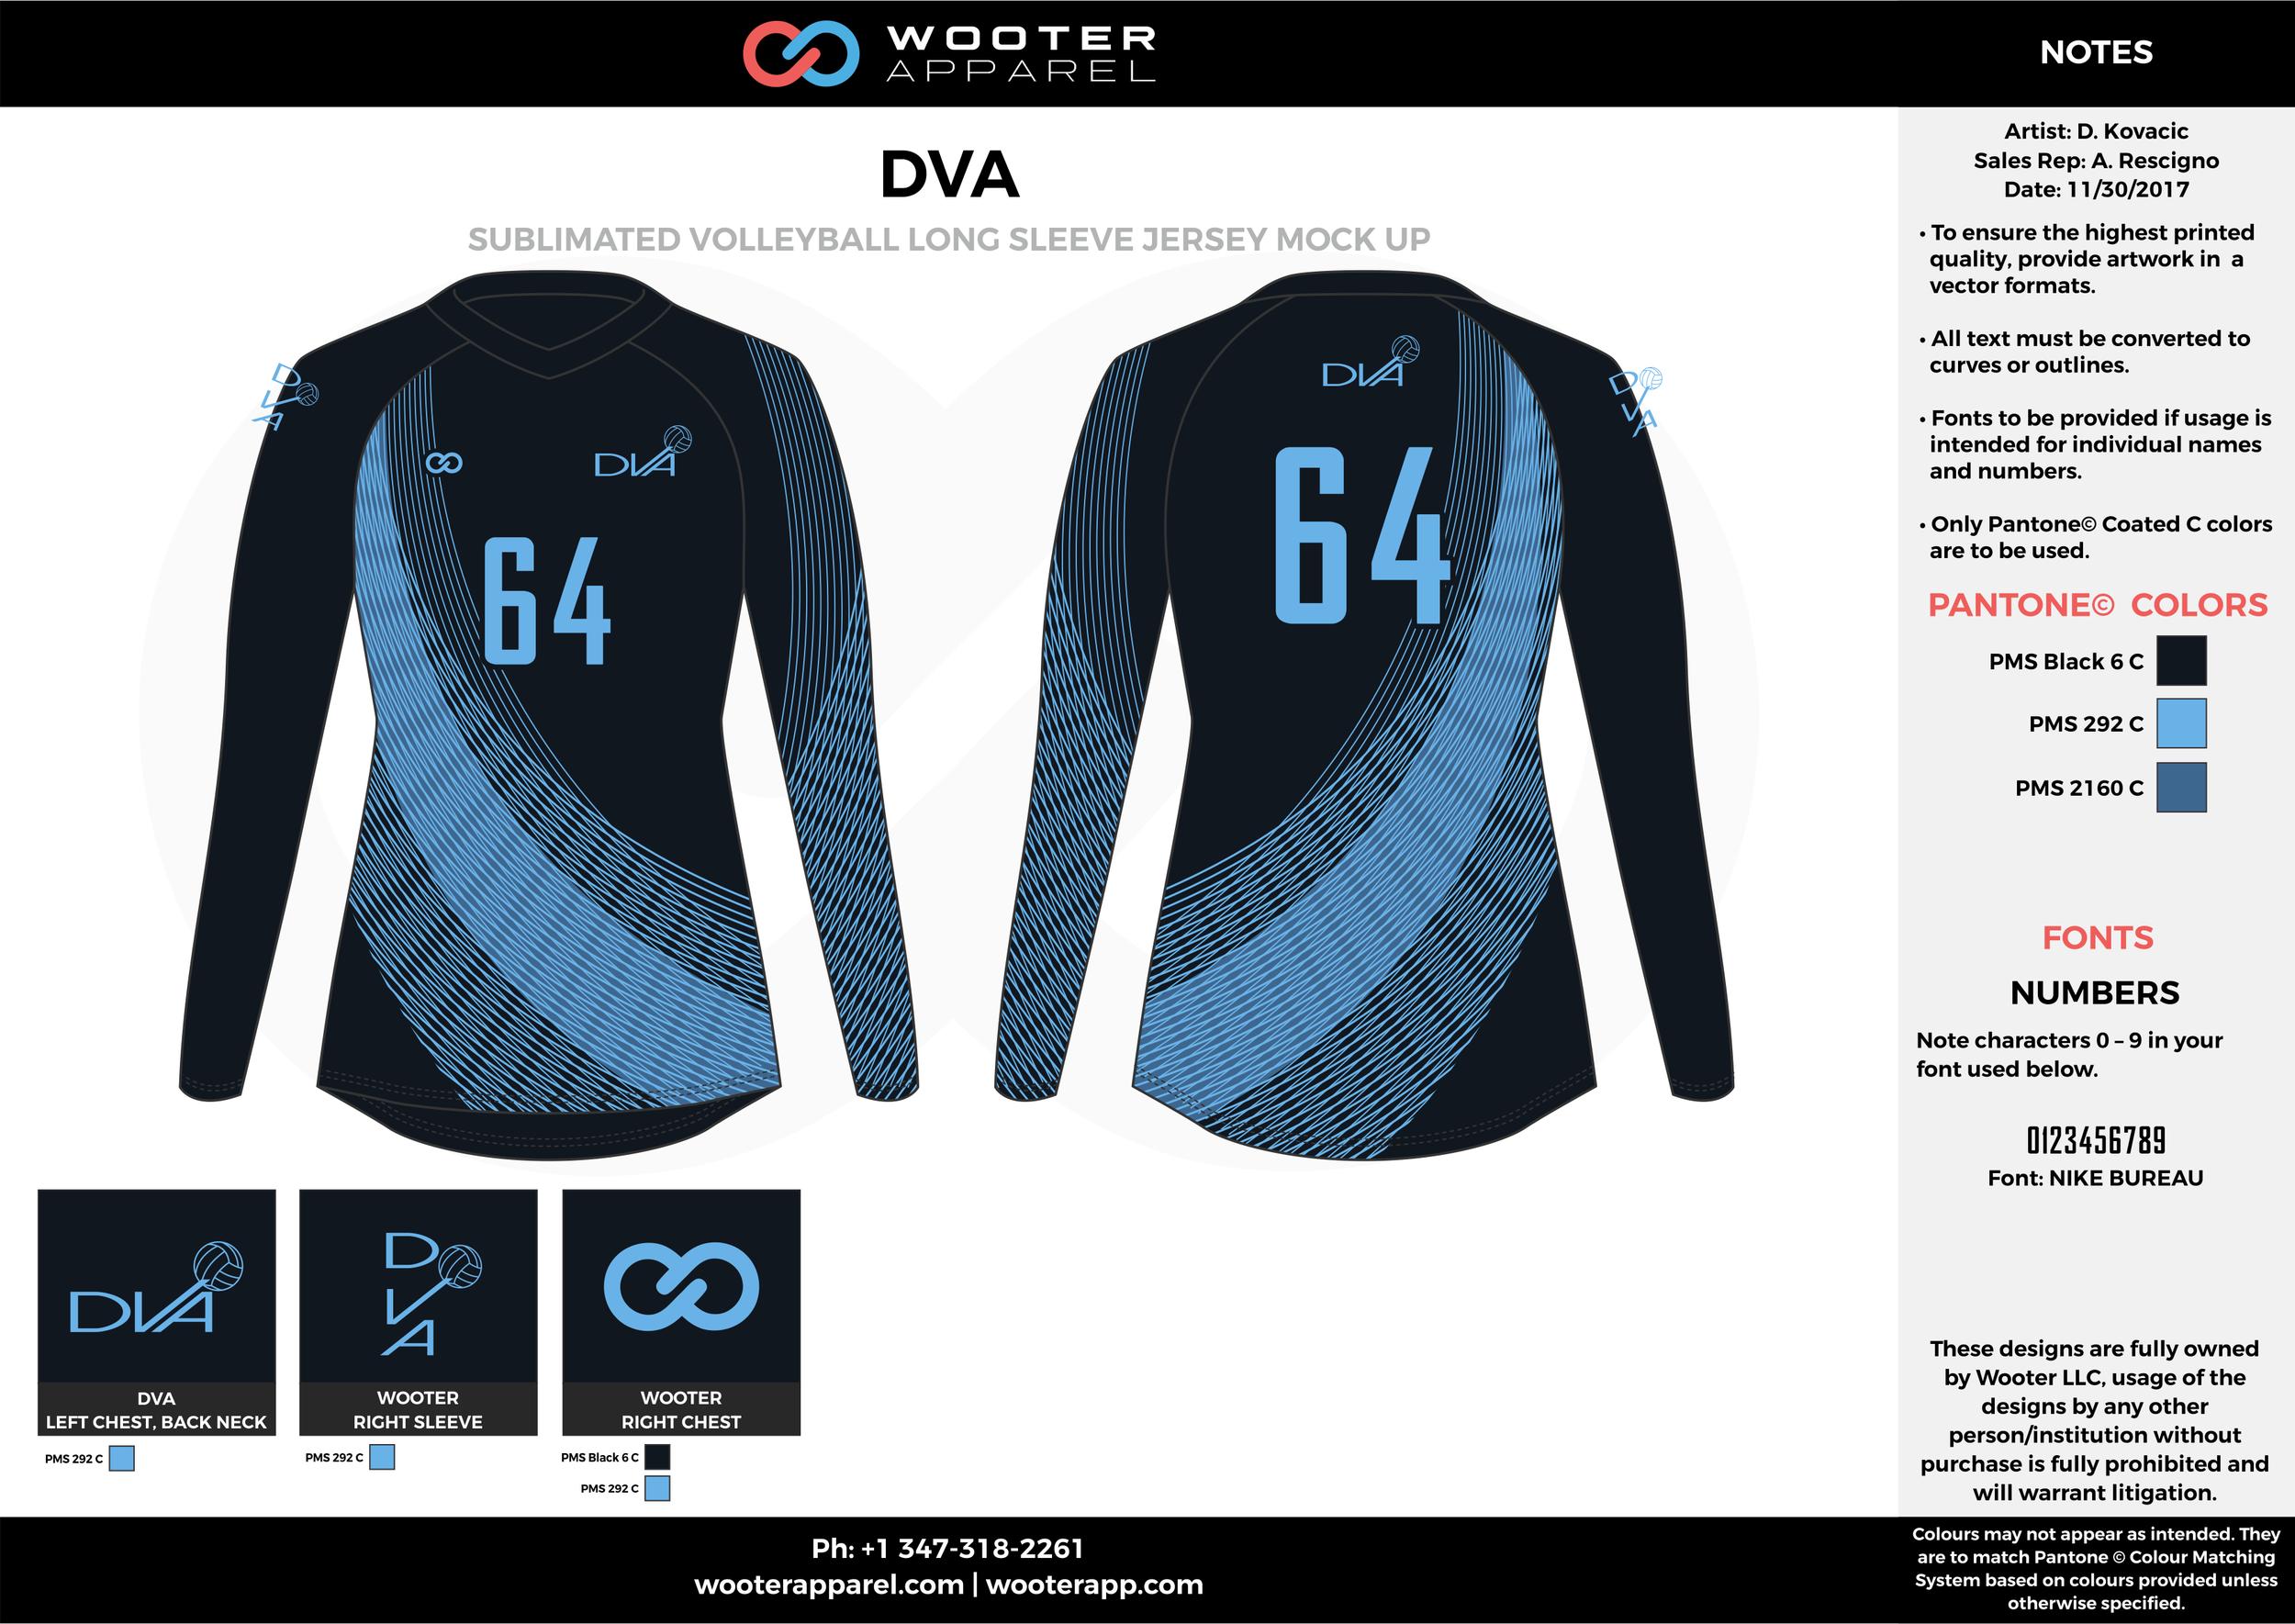 DVA sky dark blue black Volleyball Uniforms, Long sleeve Jerseys, Shorts